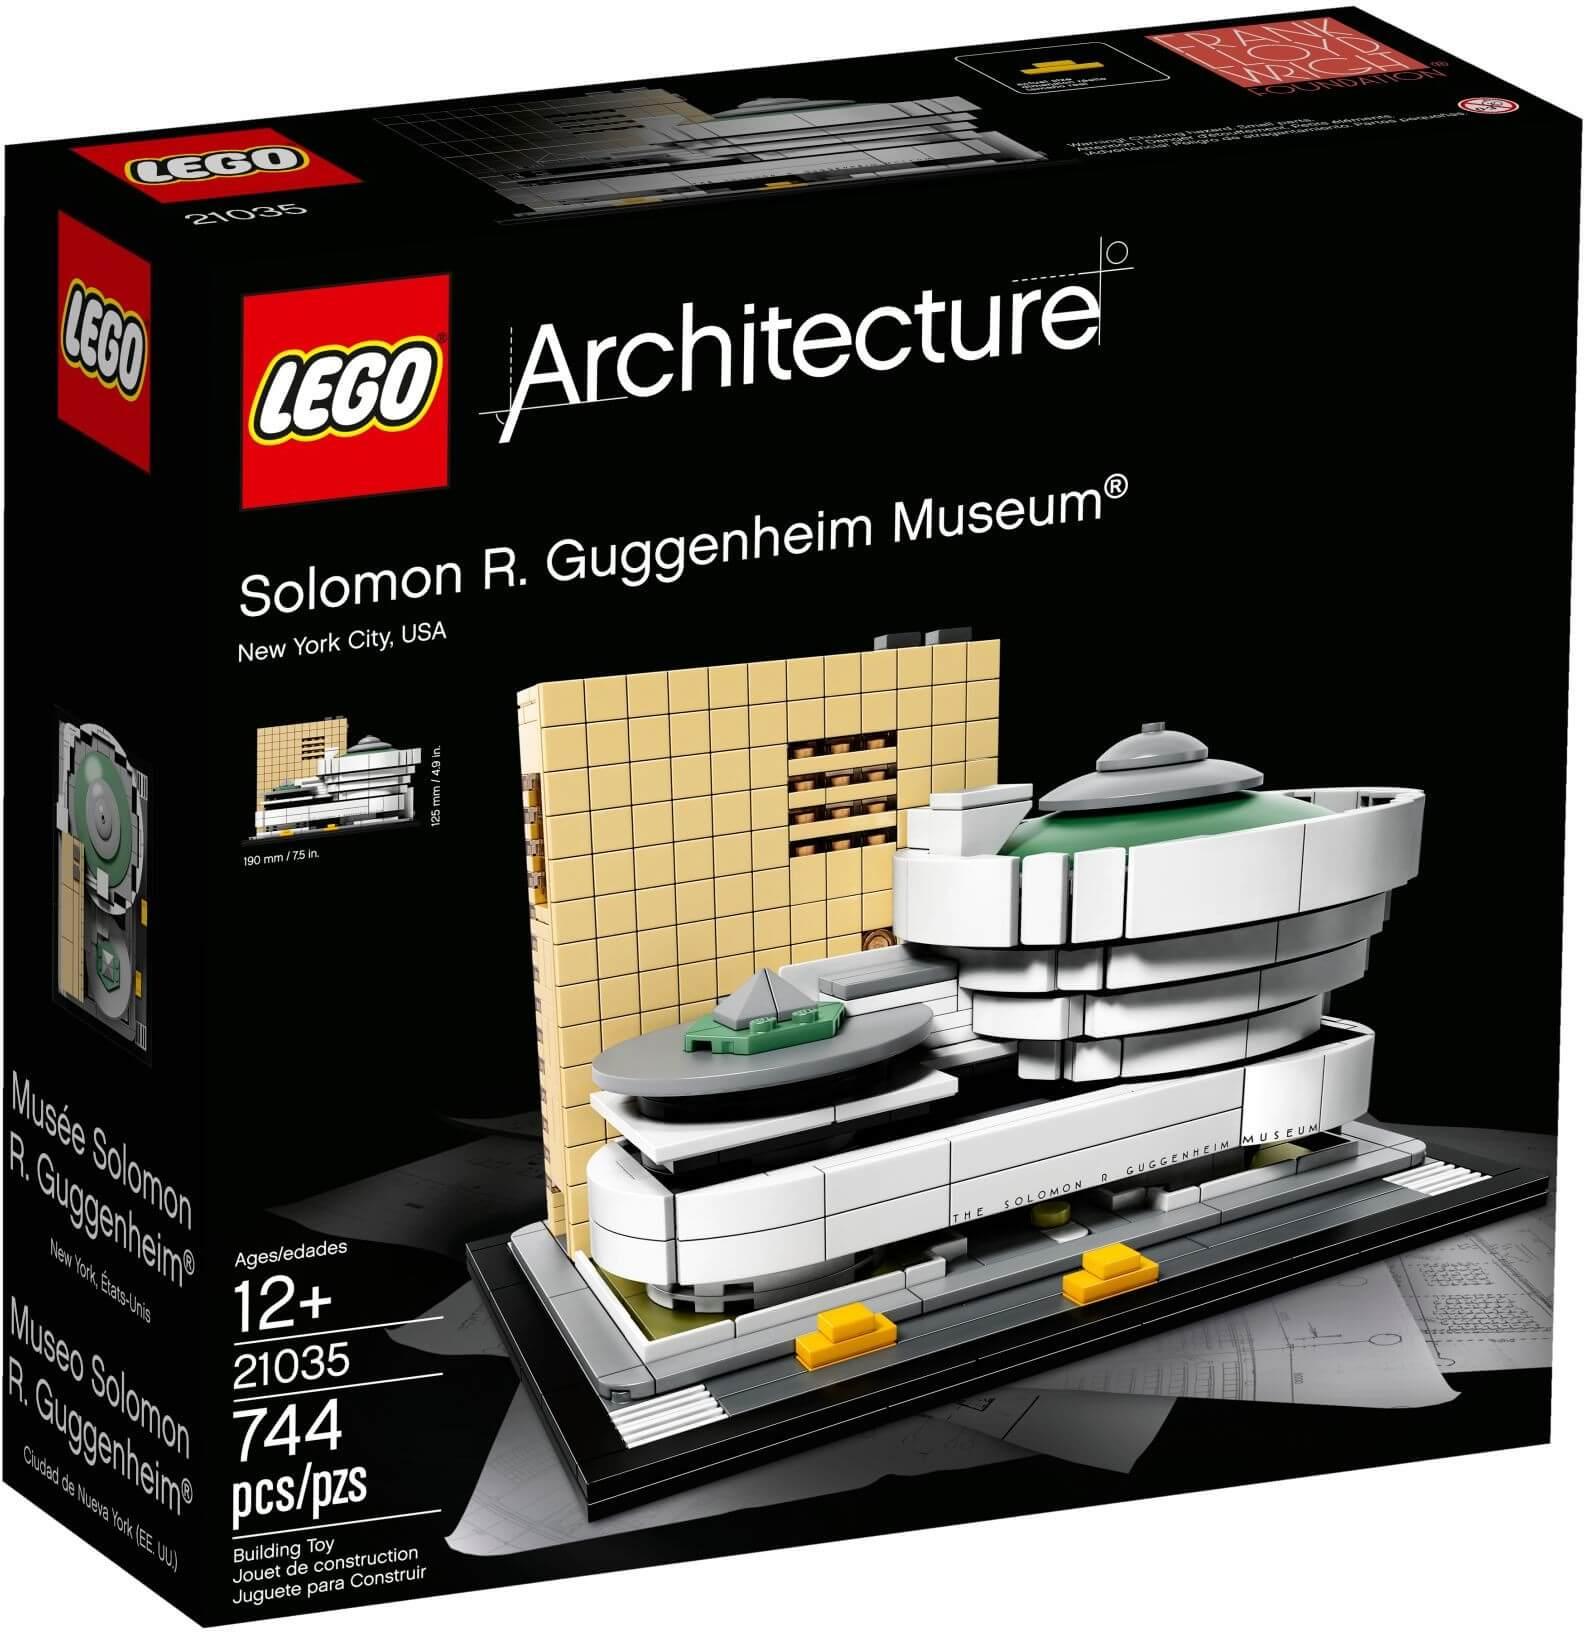 Mua đồ chơi LEGO 21035 - LEGO Architecture 21035 - Viện Bảo Tàng Solomon R. Guggenheim (LEGO Architecture Solomon R. Guggenheim Museum)